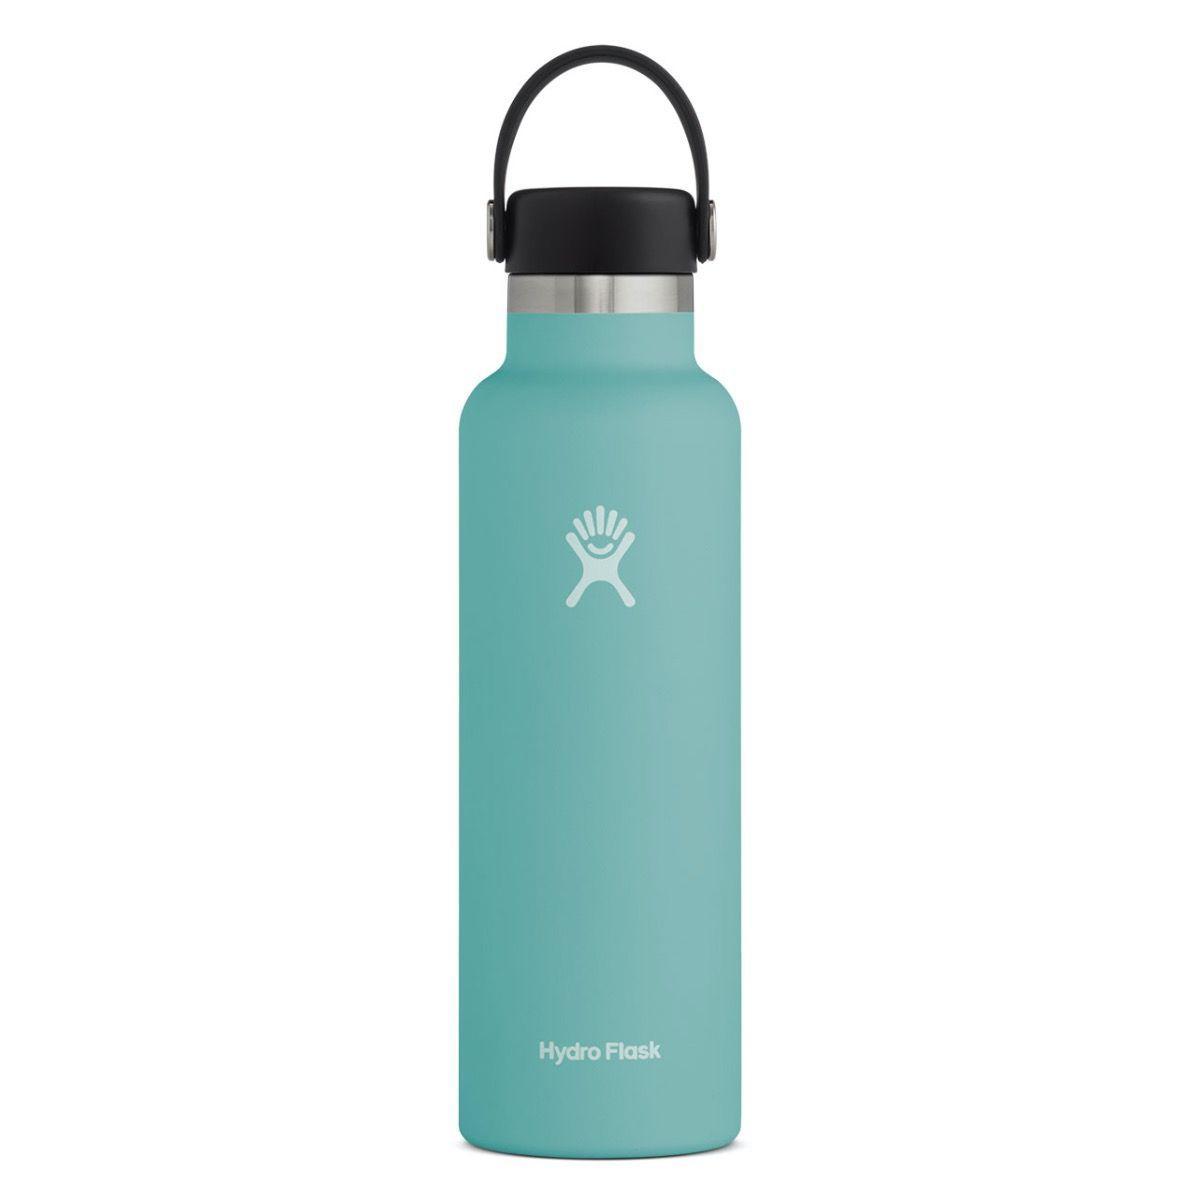 Hydro Flask 21 oz Standard Mouth Bottle, , large, image 1